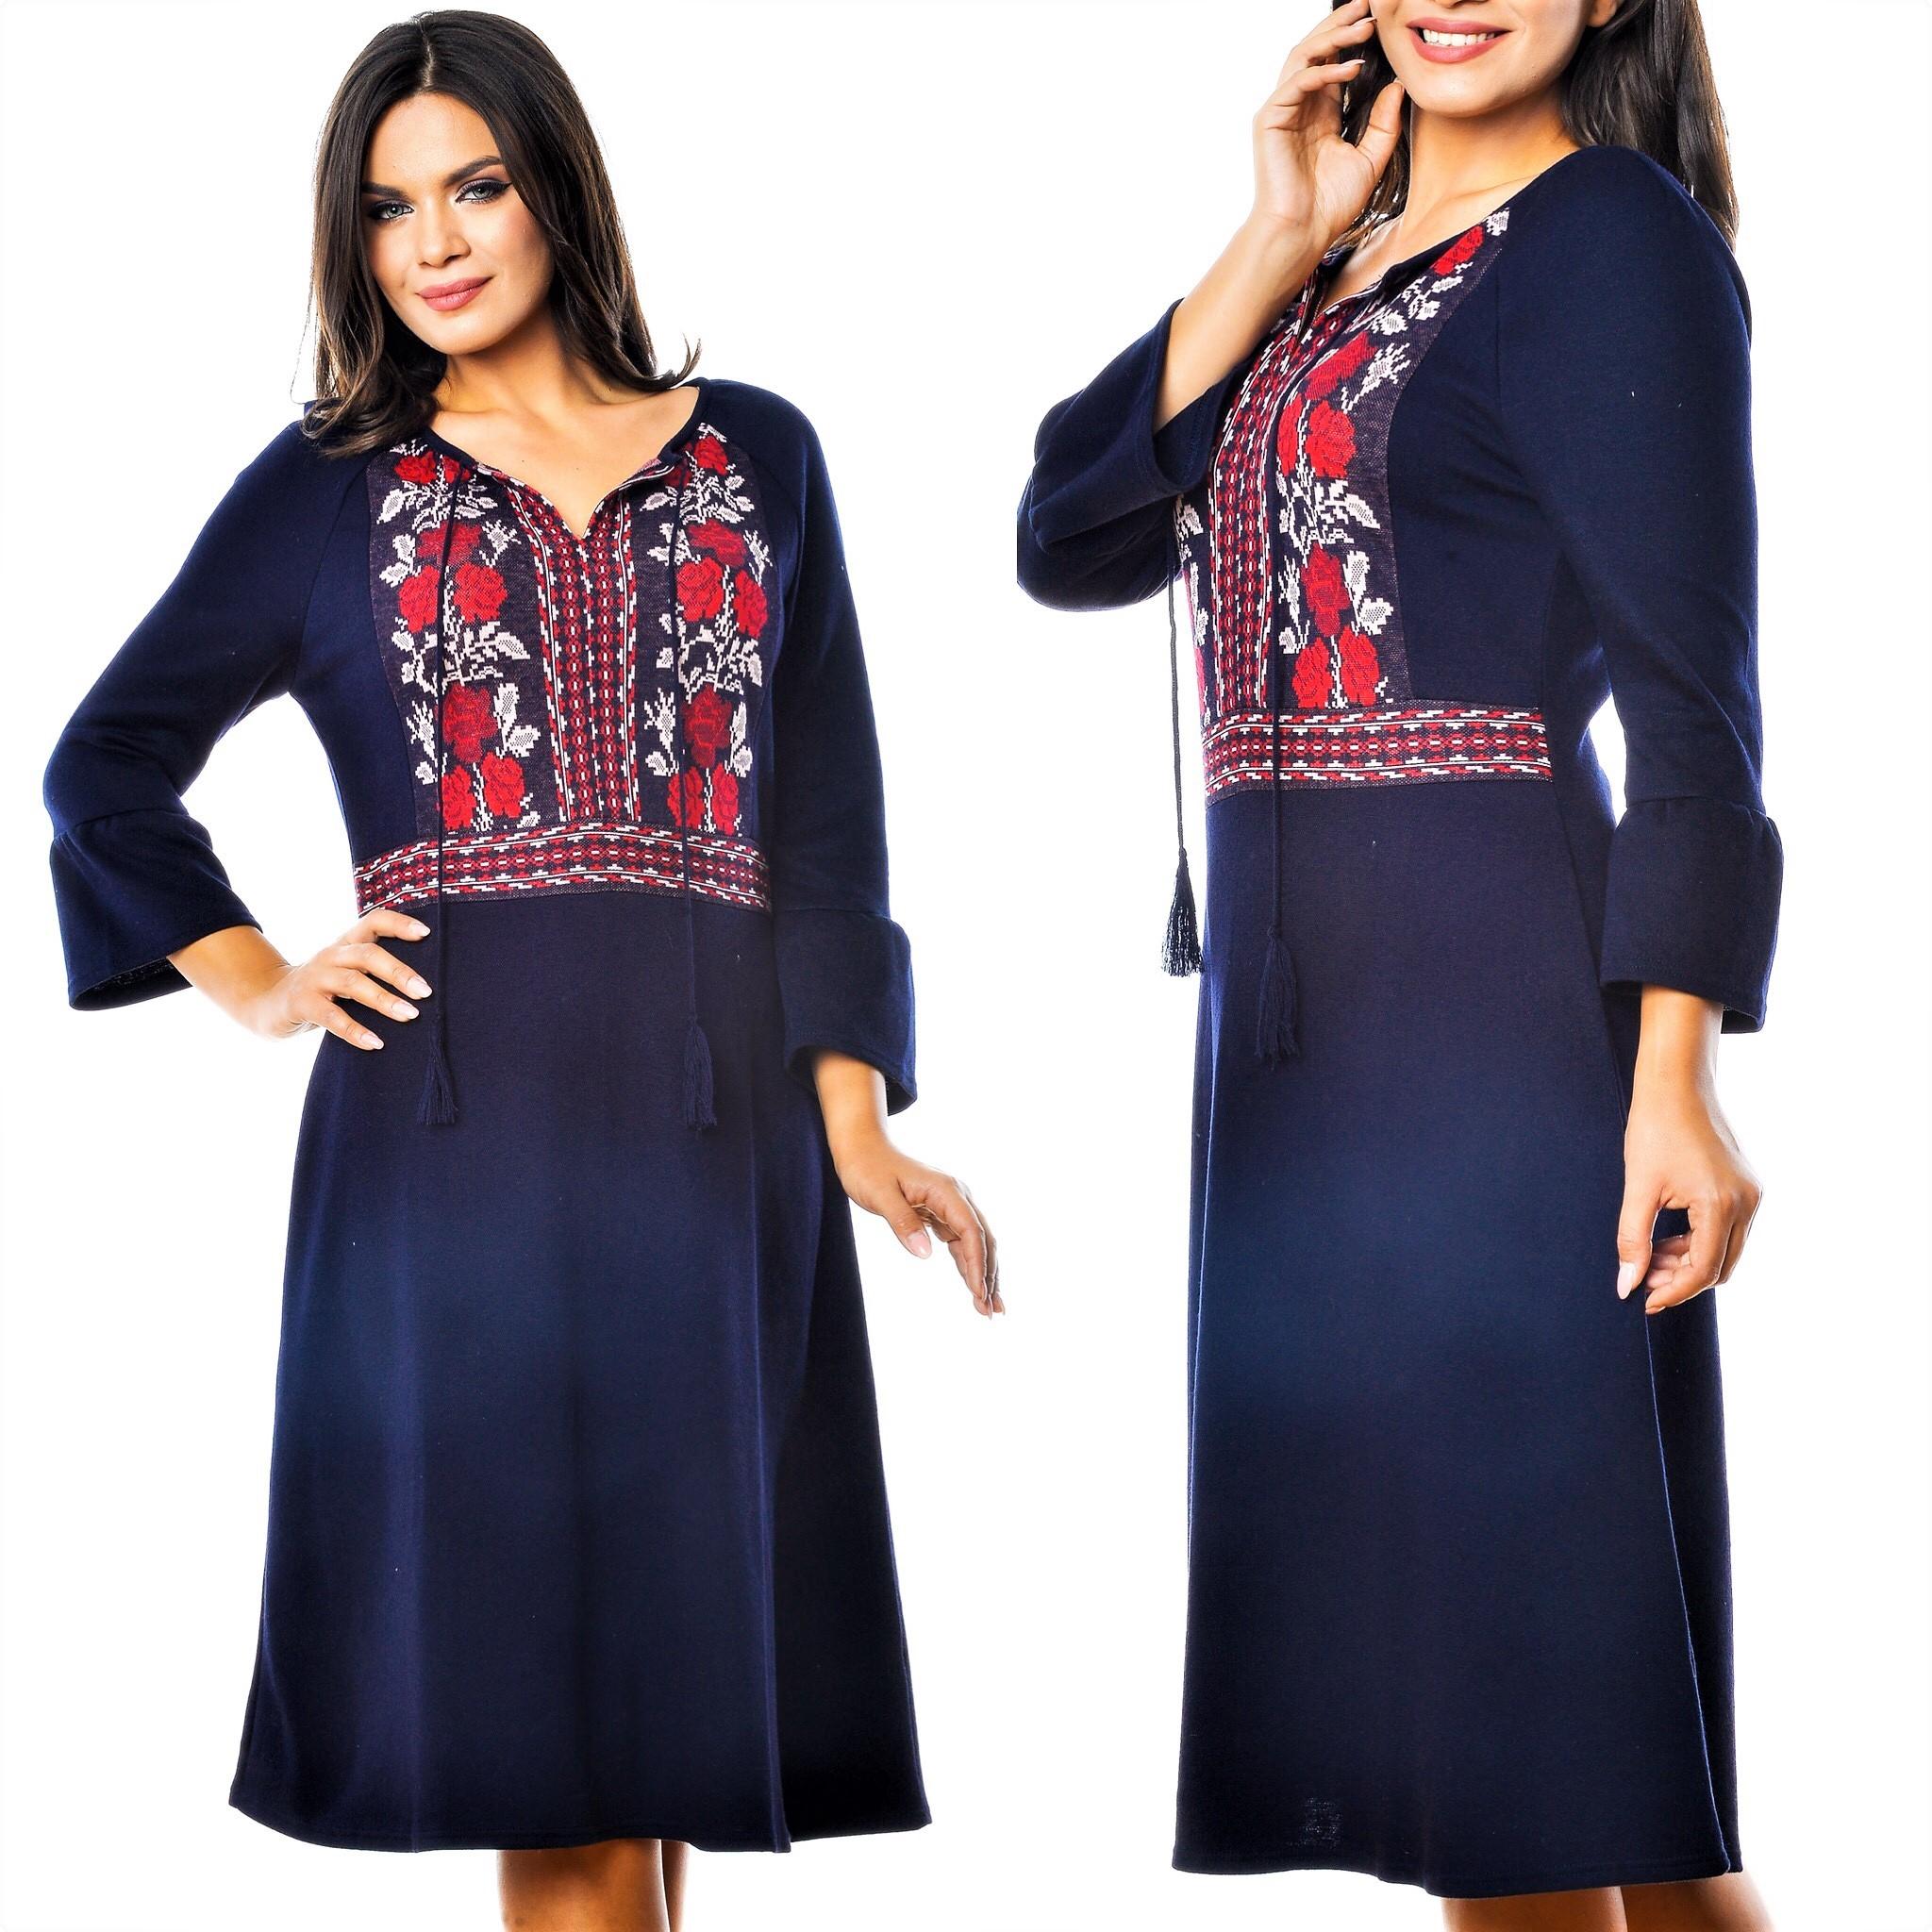 Rochie Nationala din tricot - Teodora 02